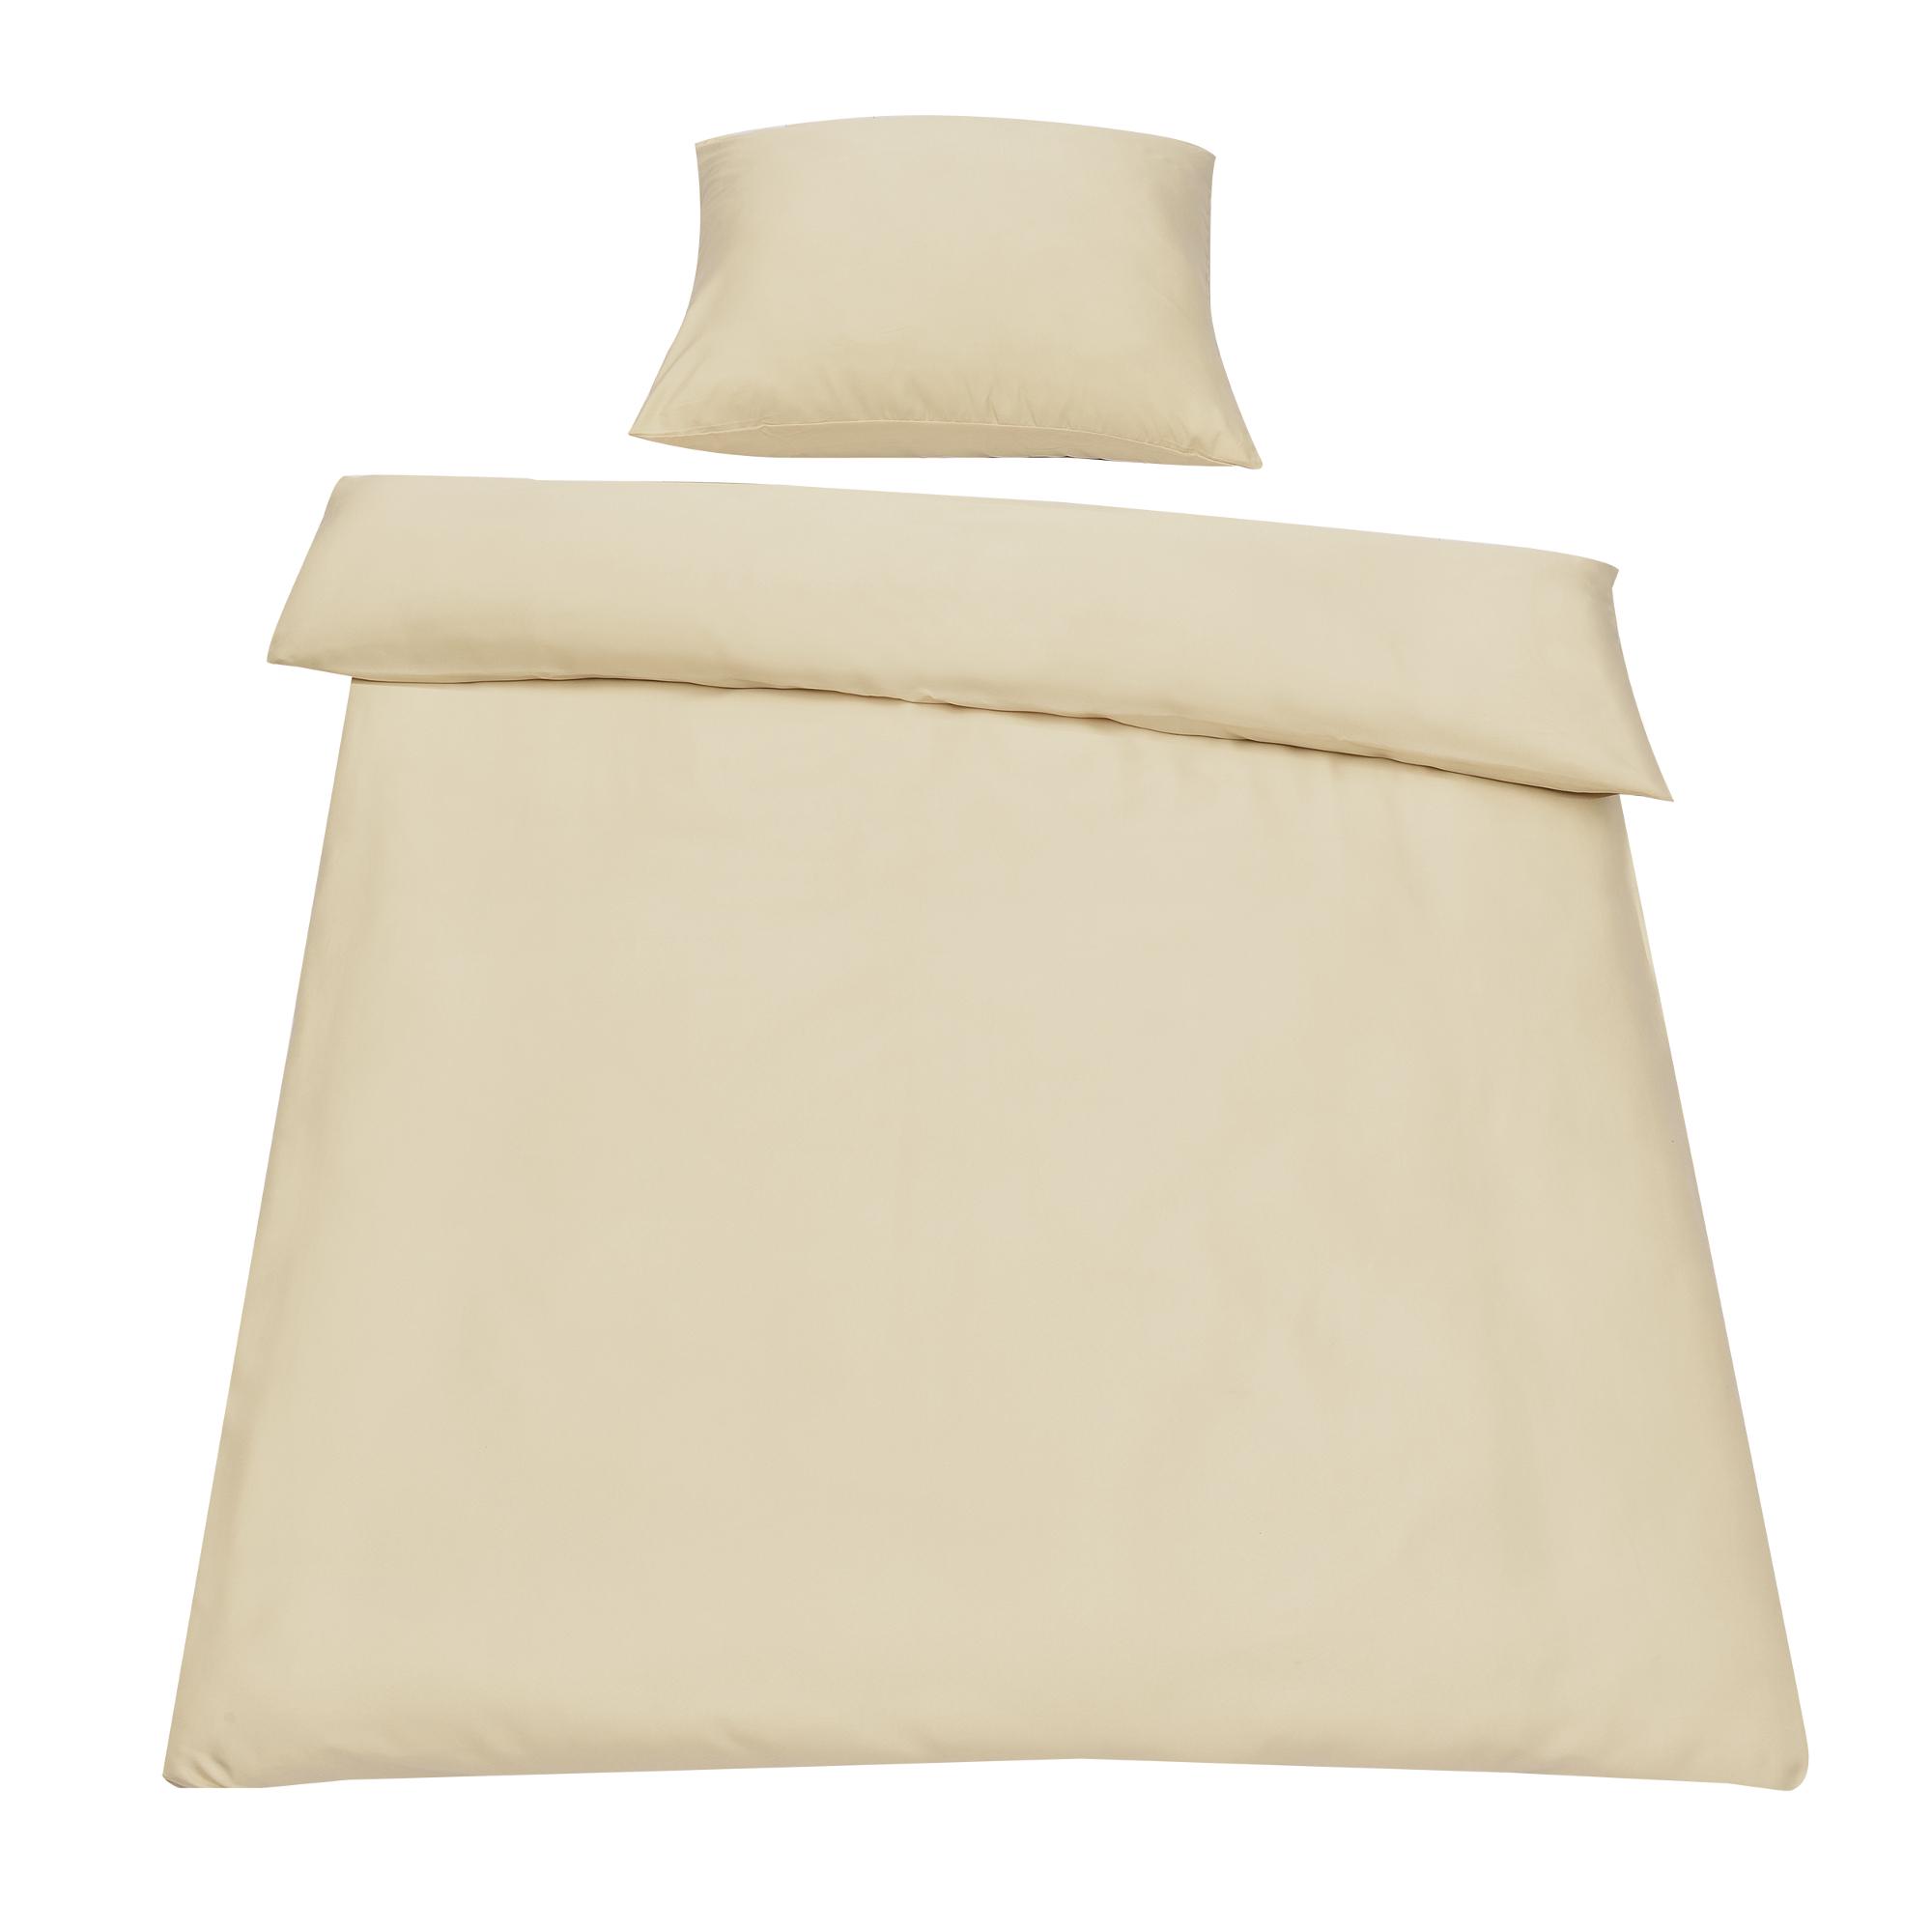 bettw sche kissenbezug kopfkissen bettbezug microfaser ko tex ebay. Black Bedroom Furniture Sets. Home Design Ideas